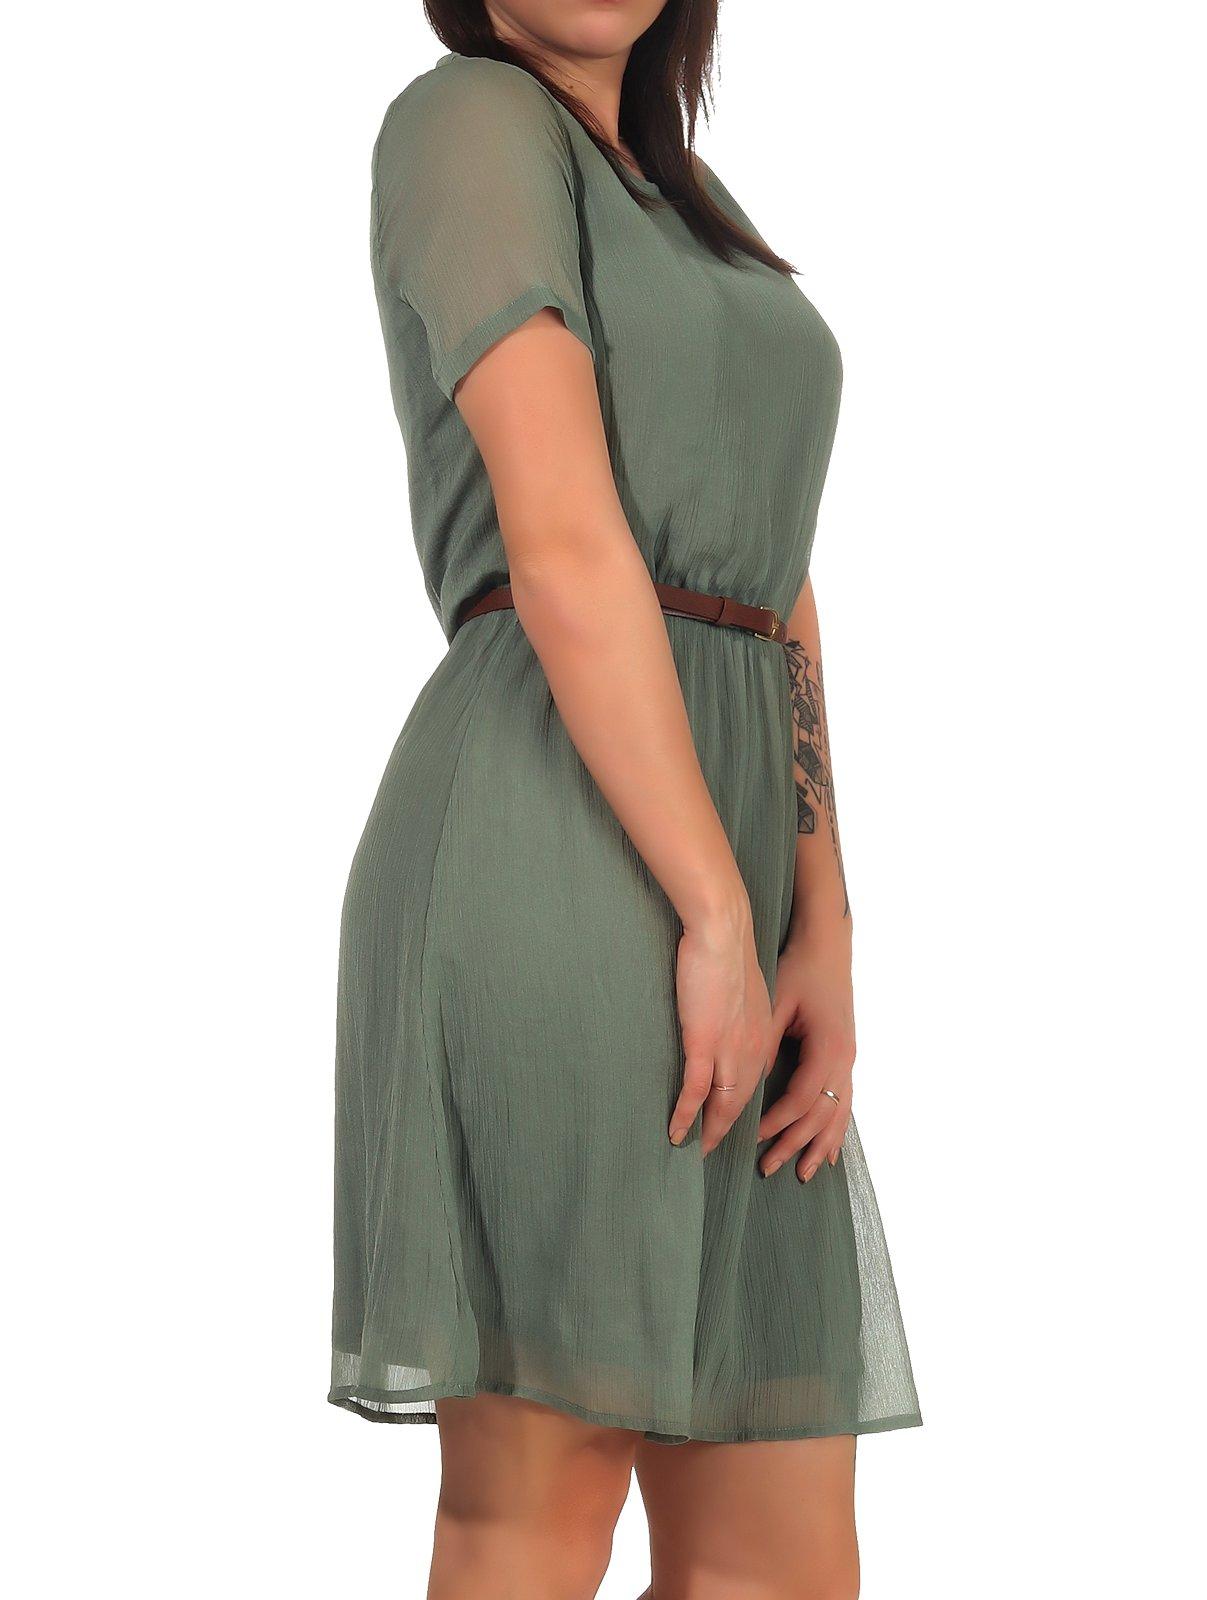 Vero Moda Damen Kleid Frida | Röcke/ Kleider | Damen | L.E ...